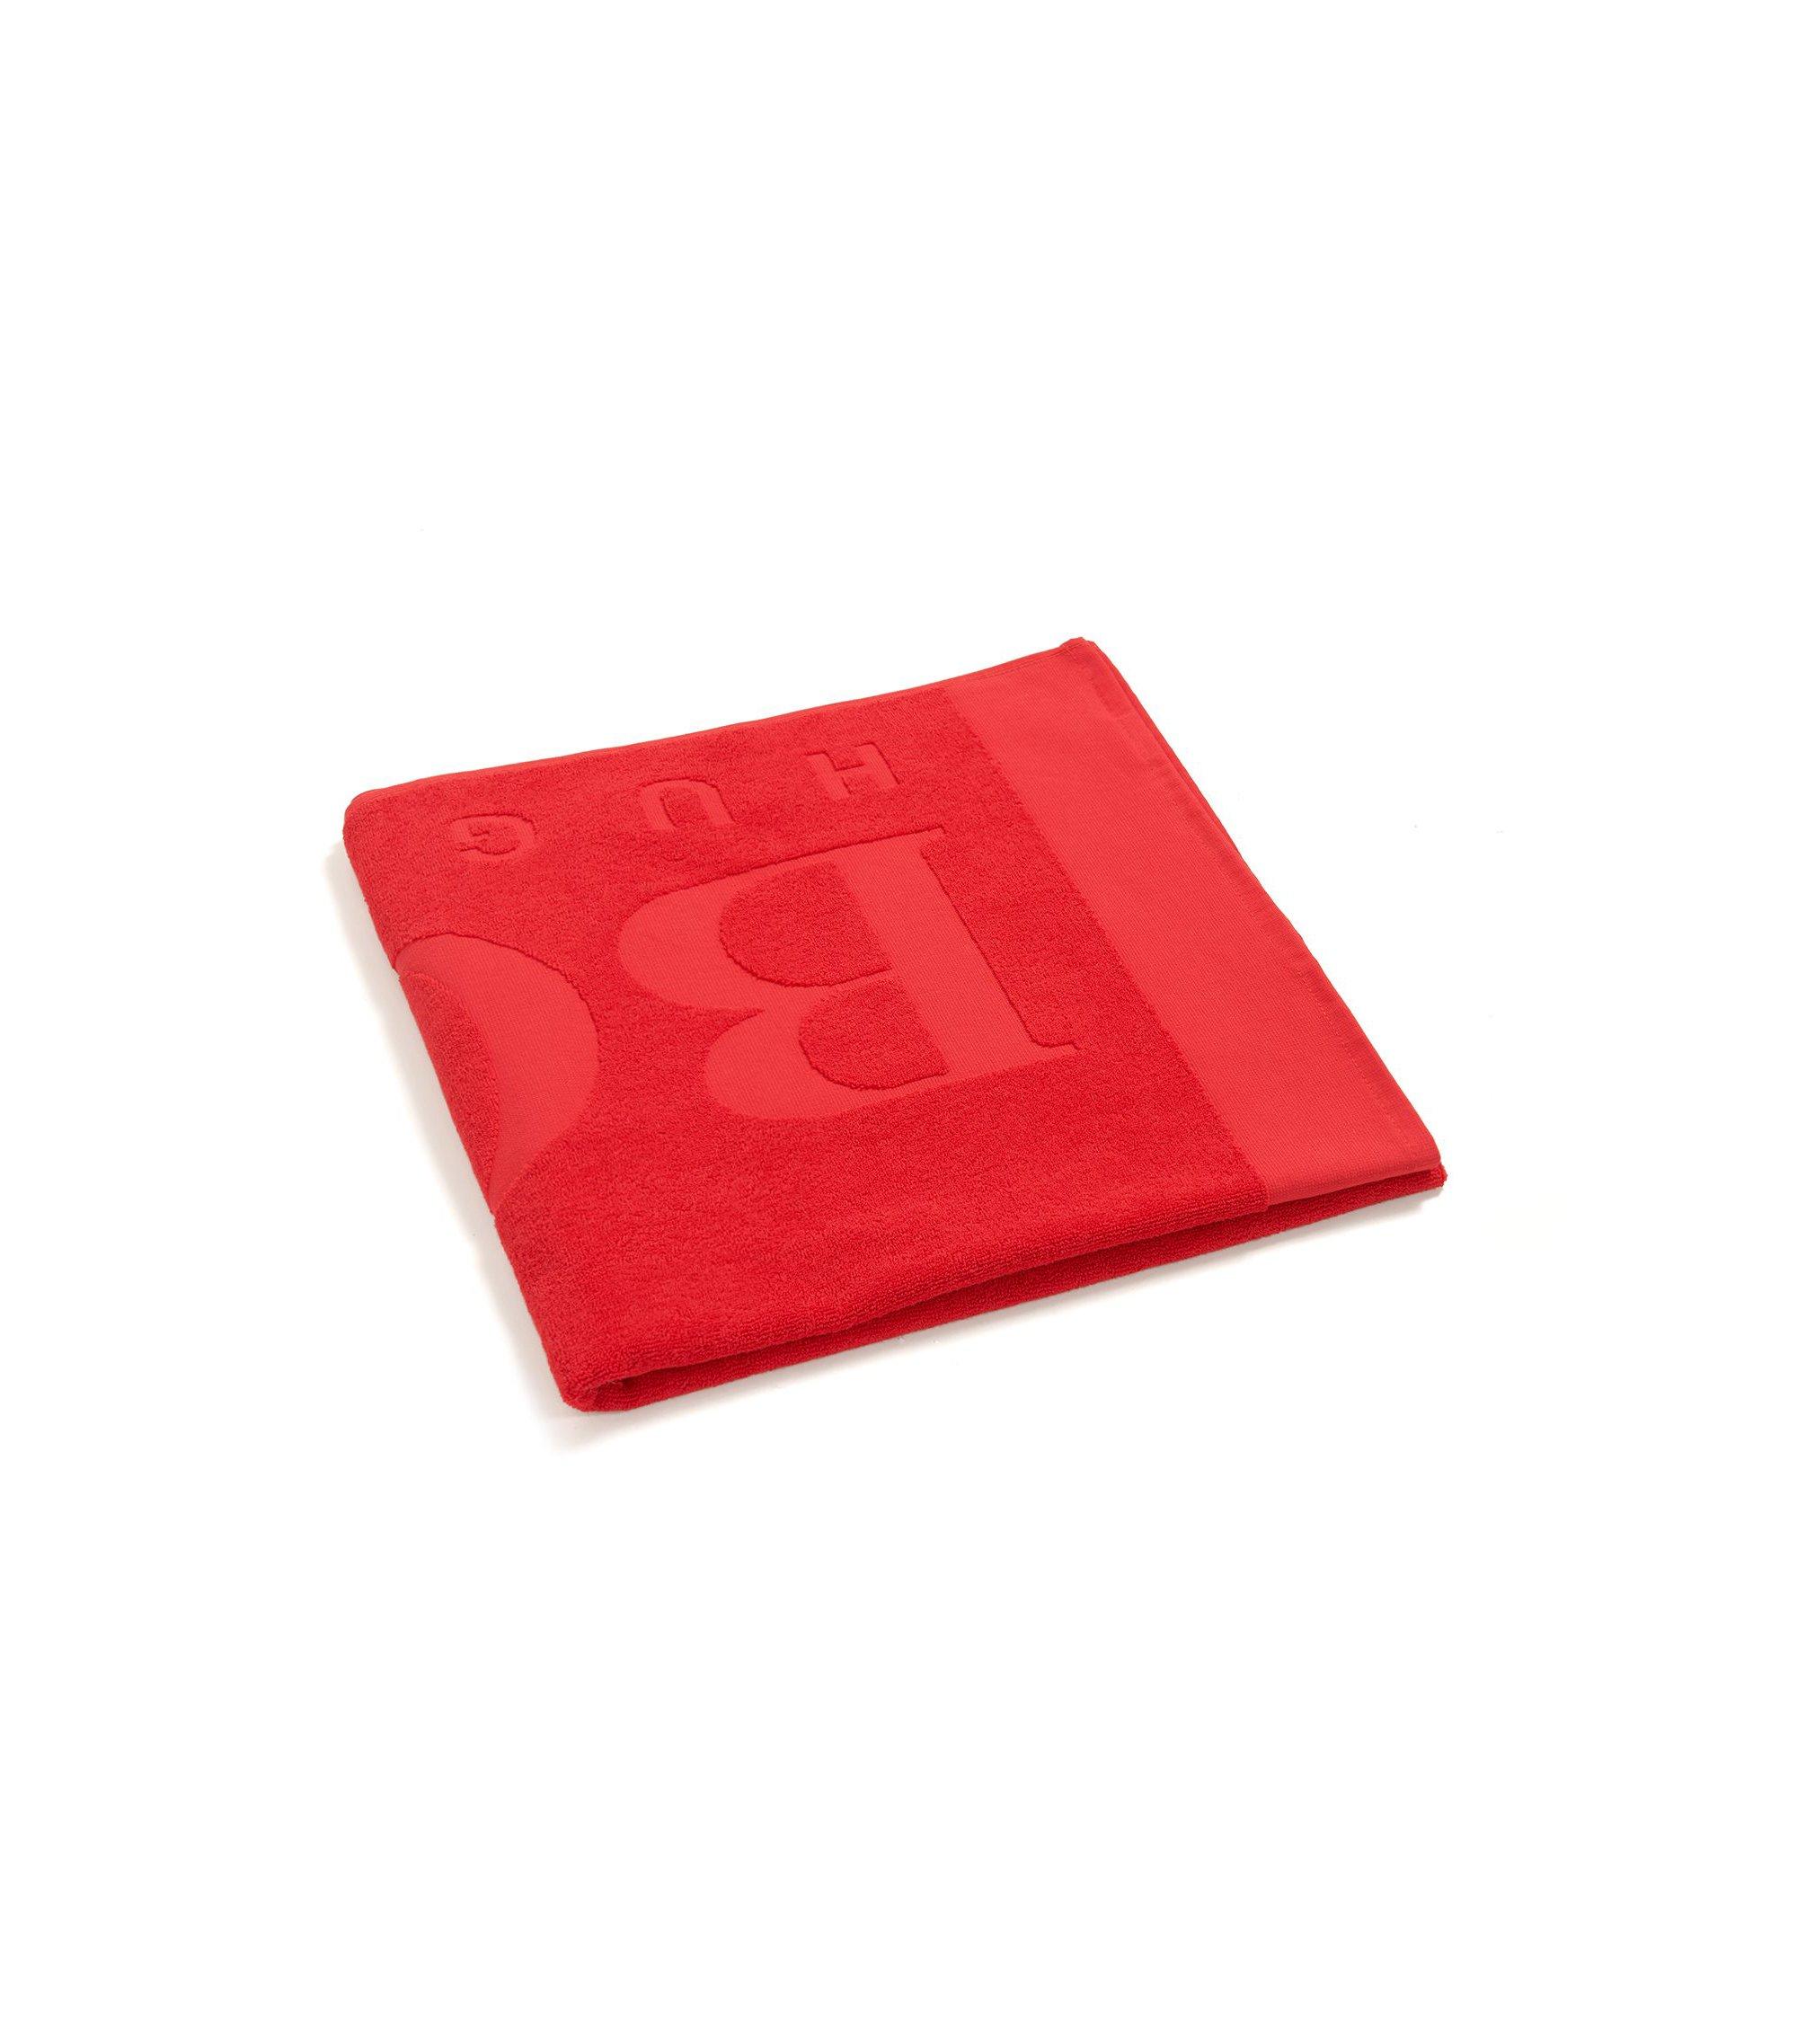 Badetuch aus softem Baumwoll-Jacquard mit Logo, Rot